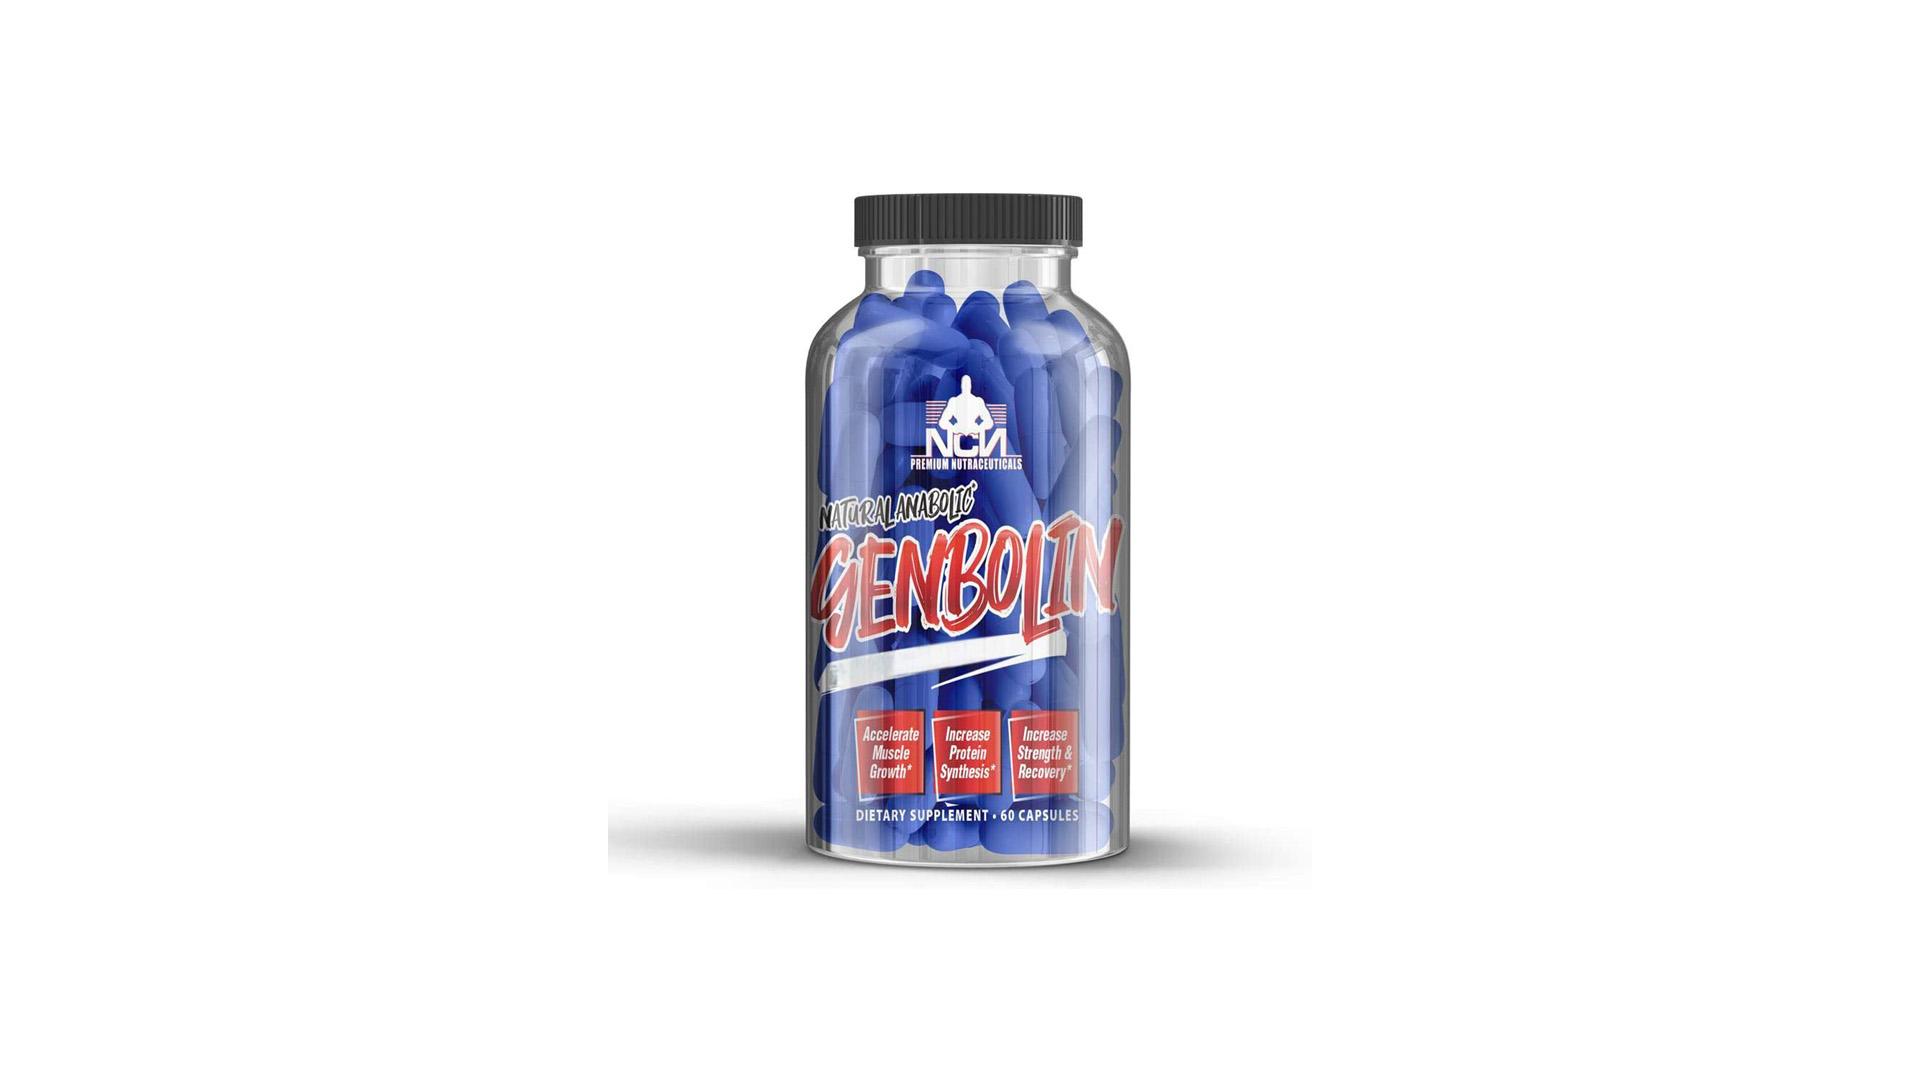 Genbolin laxogenin supplement